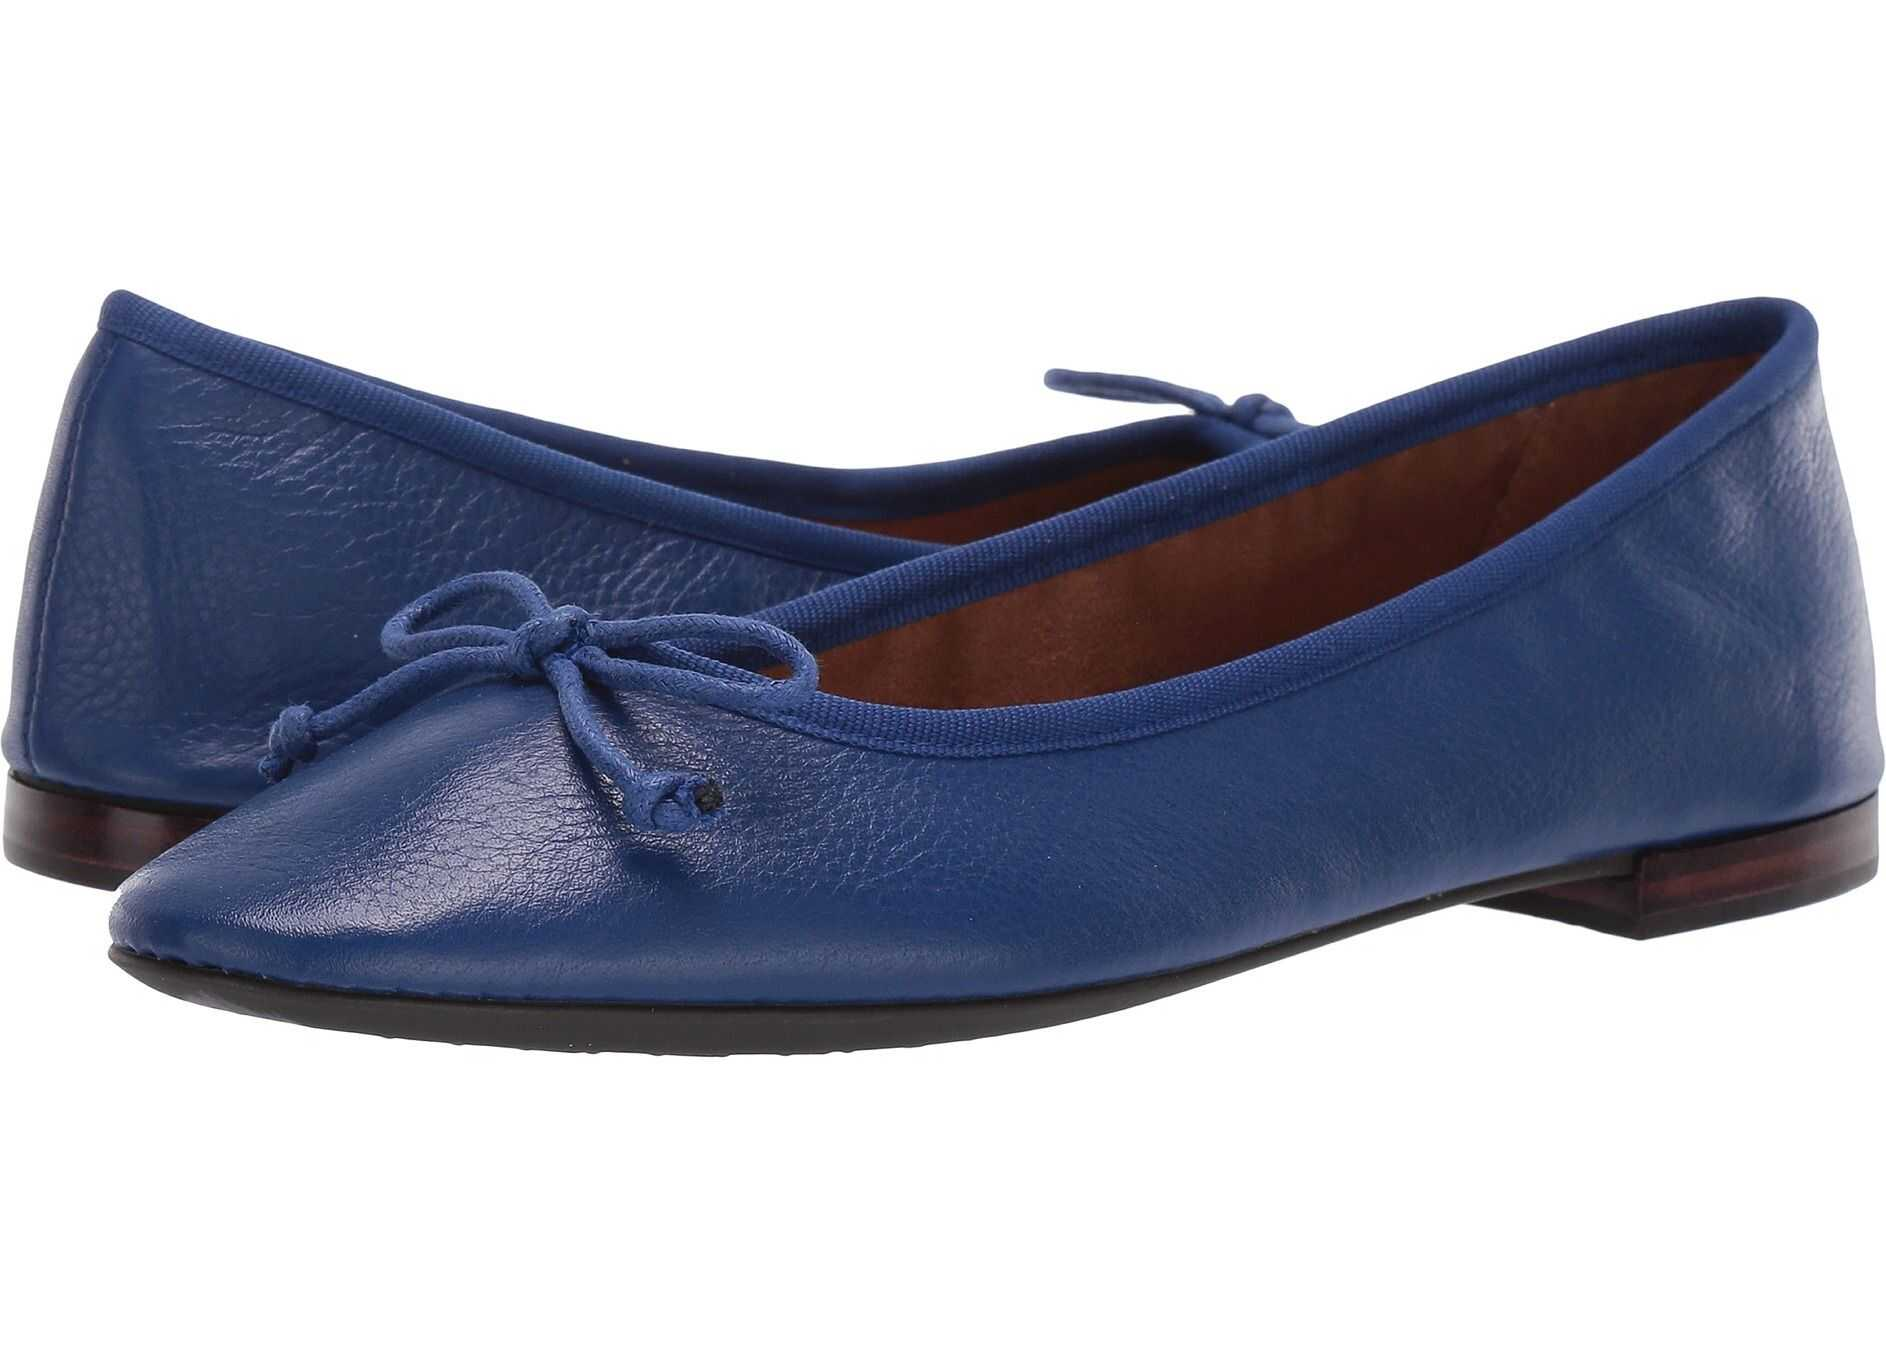 Aerosoles Homerun Blue Leather